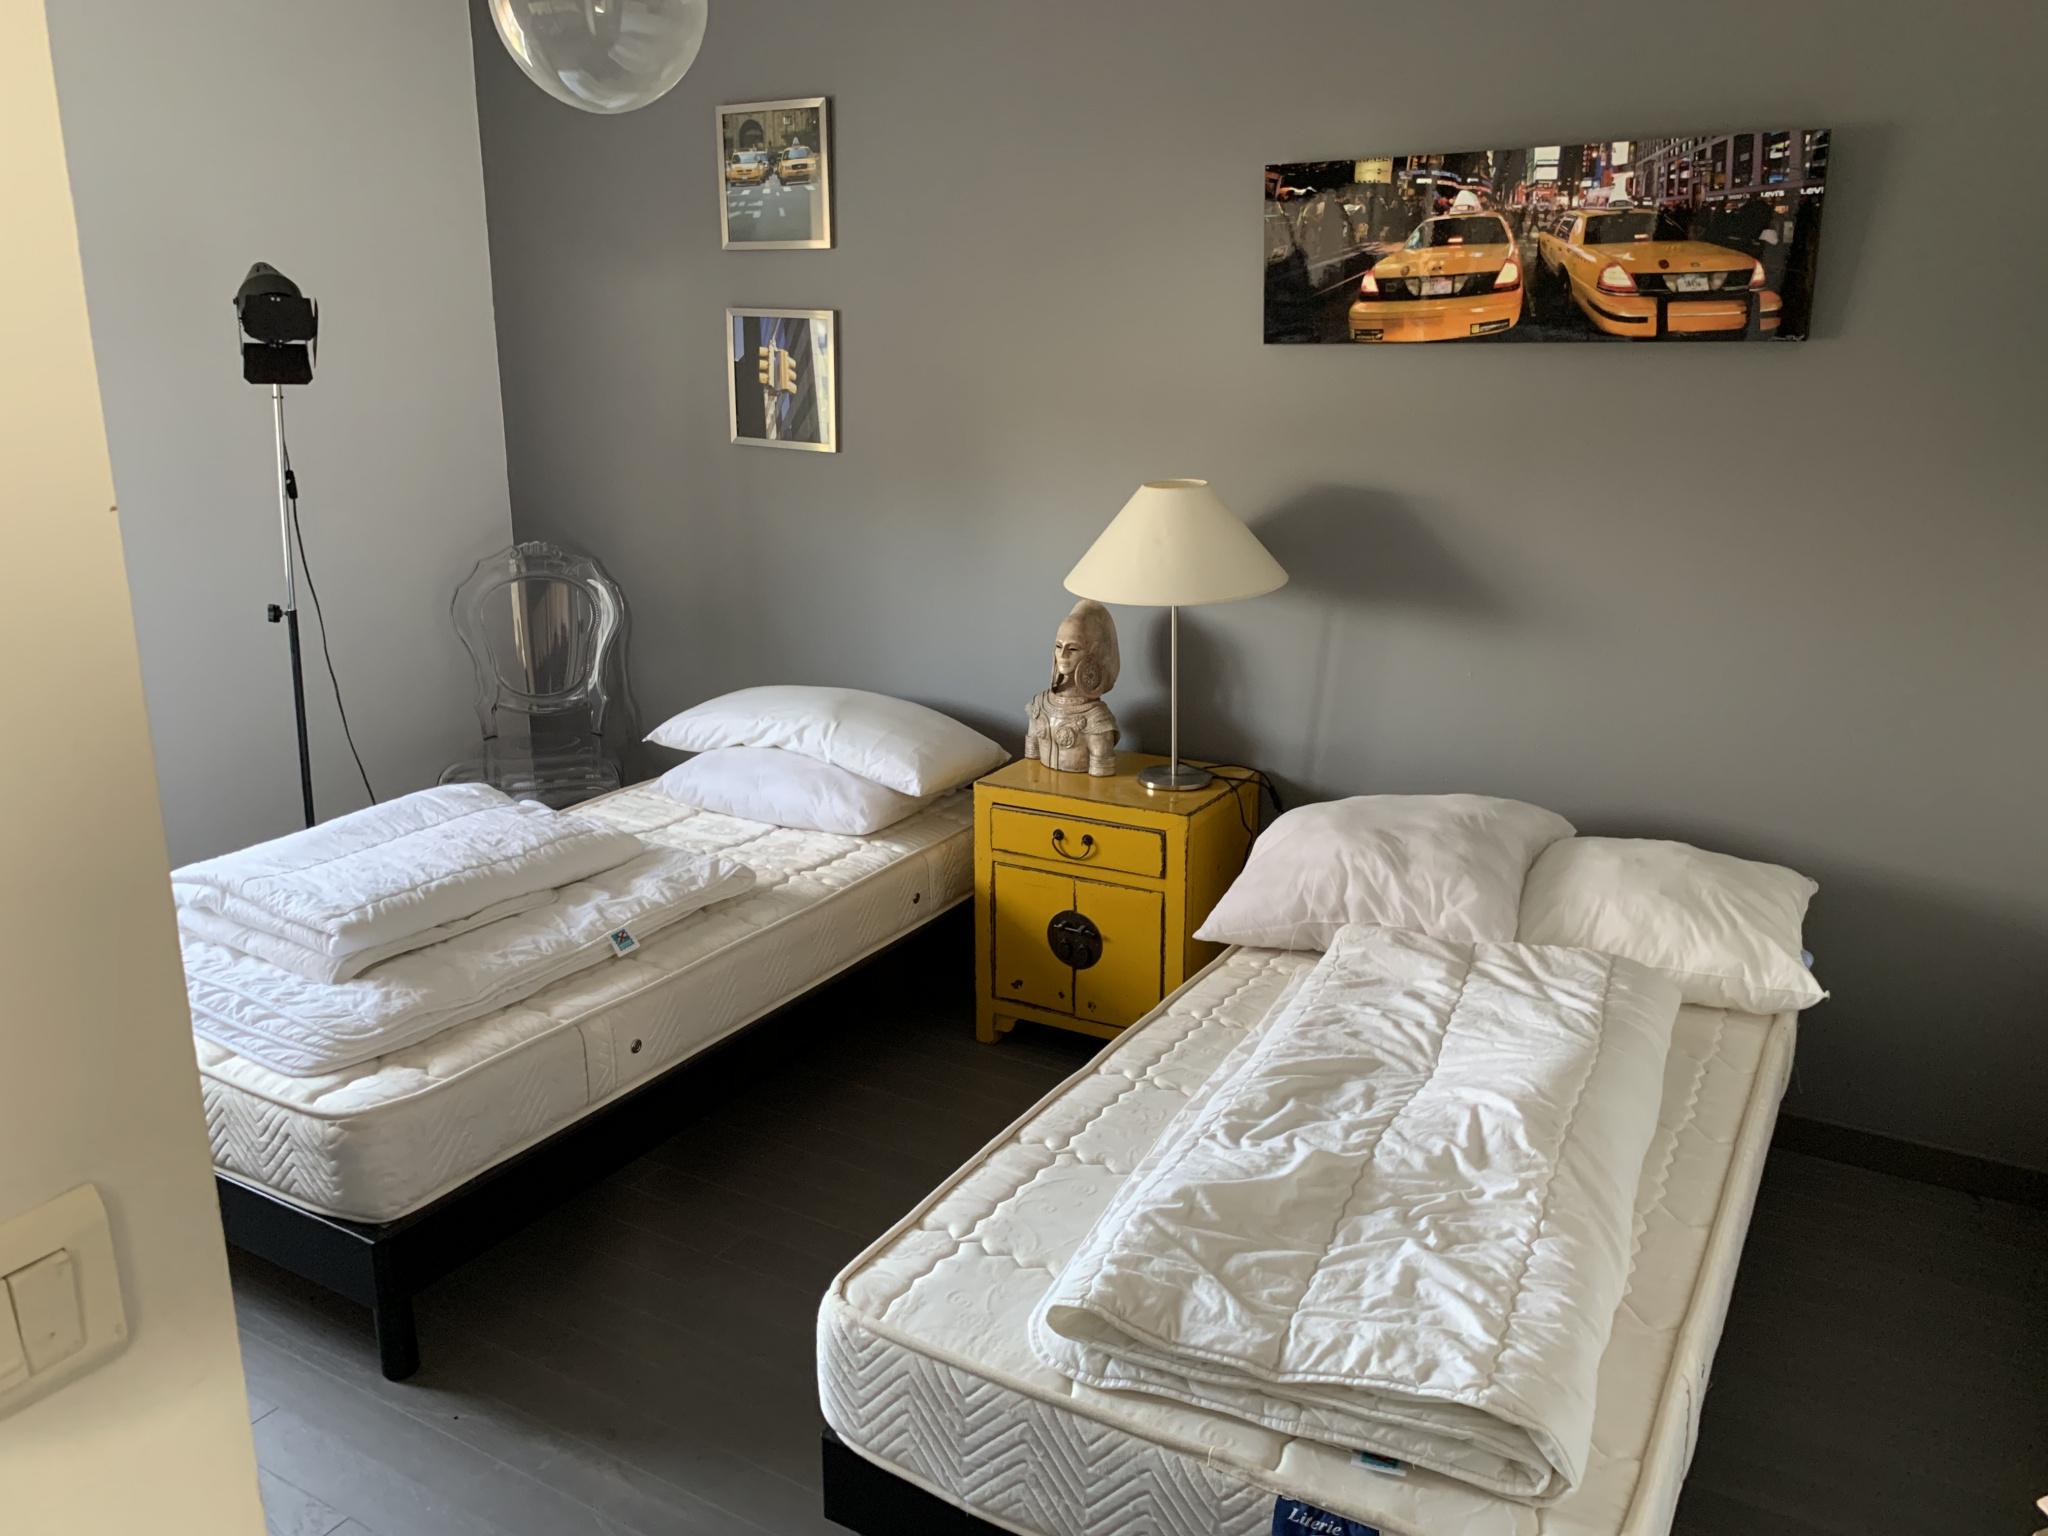 Literie Vaison La Romaine vente villa 170 m2 5 chambres